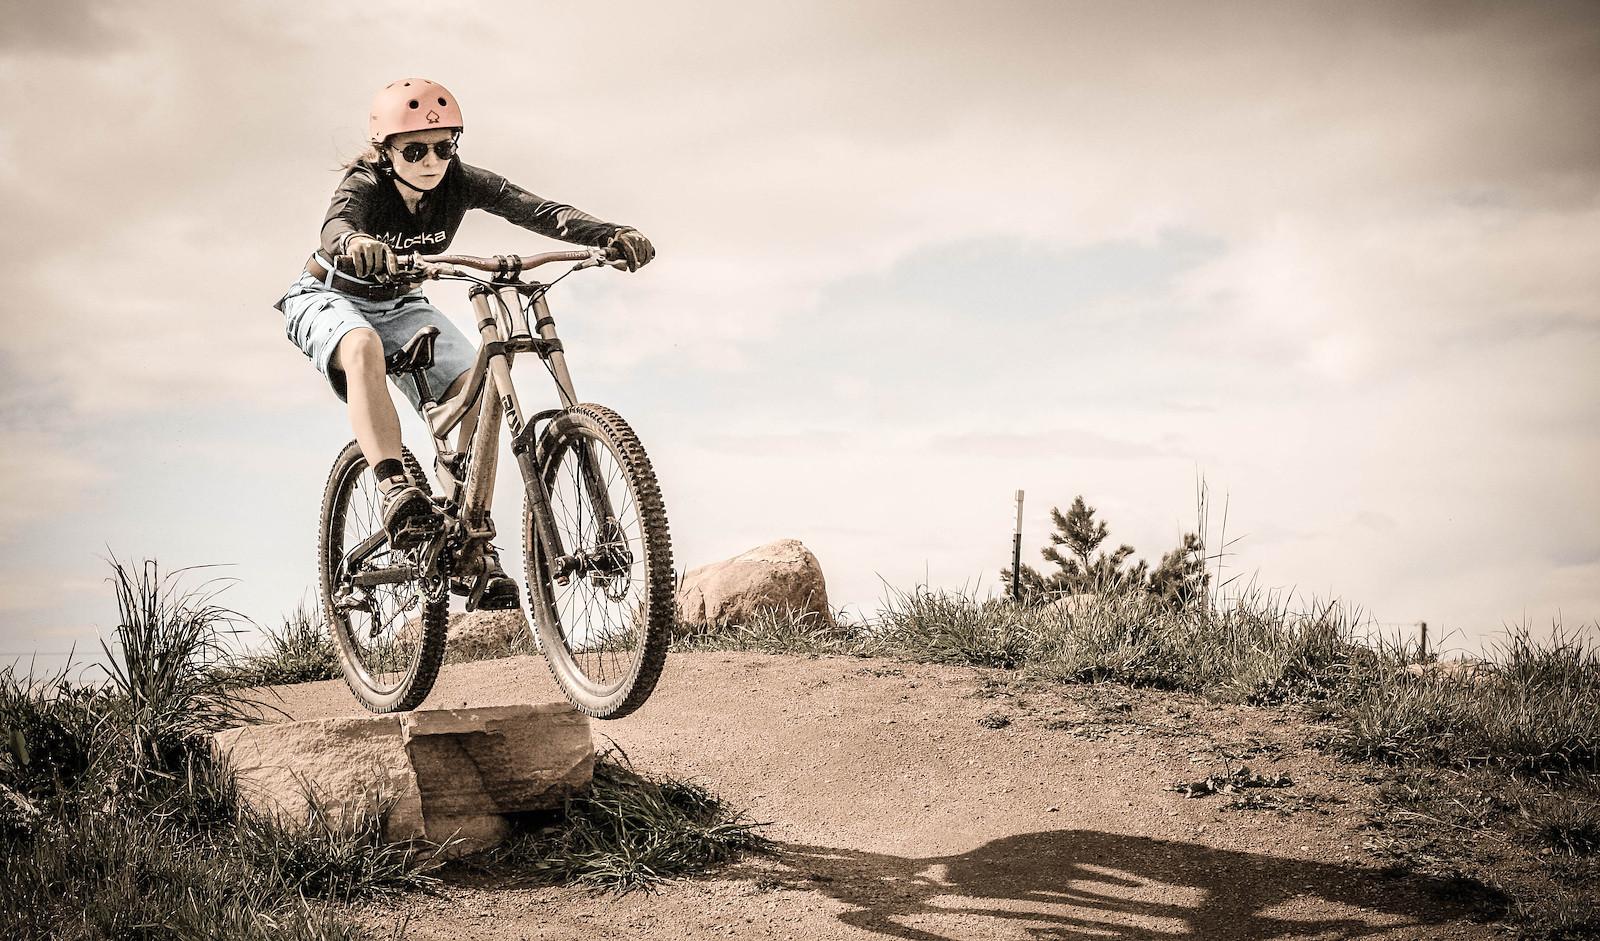 Dropping In - rhiannon - Mountain Biking Pictures - Vital MTB